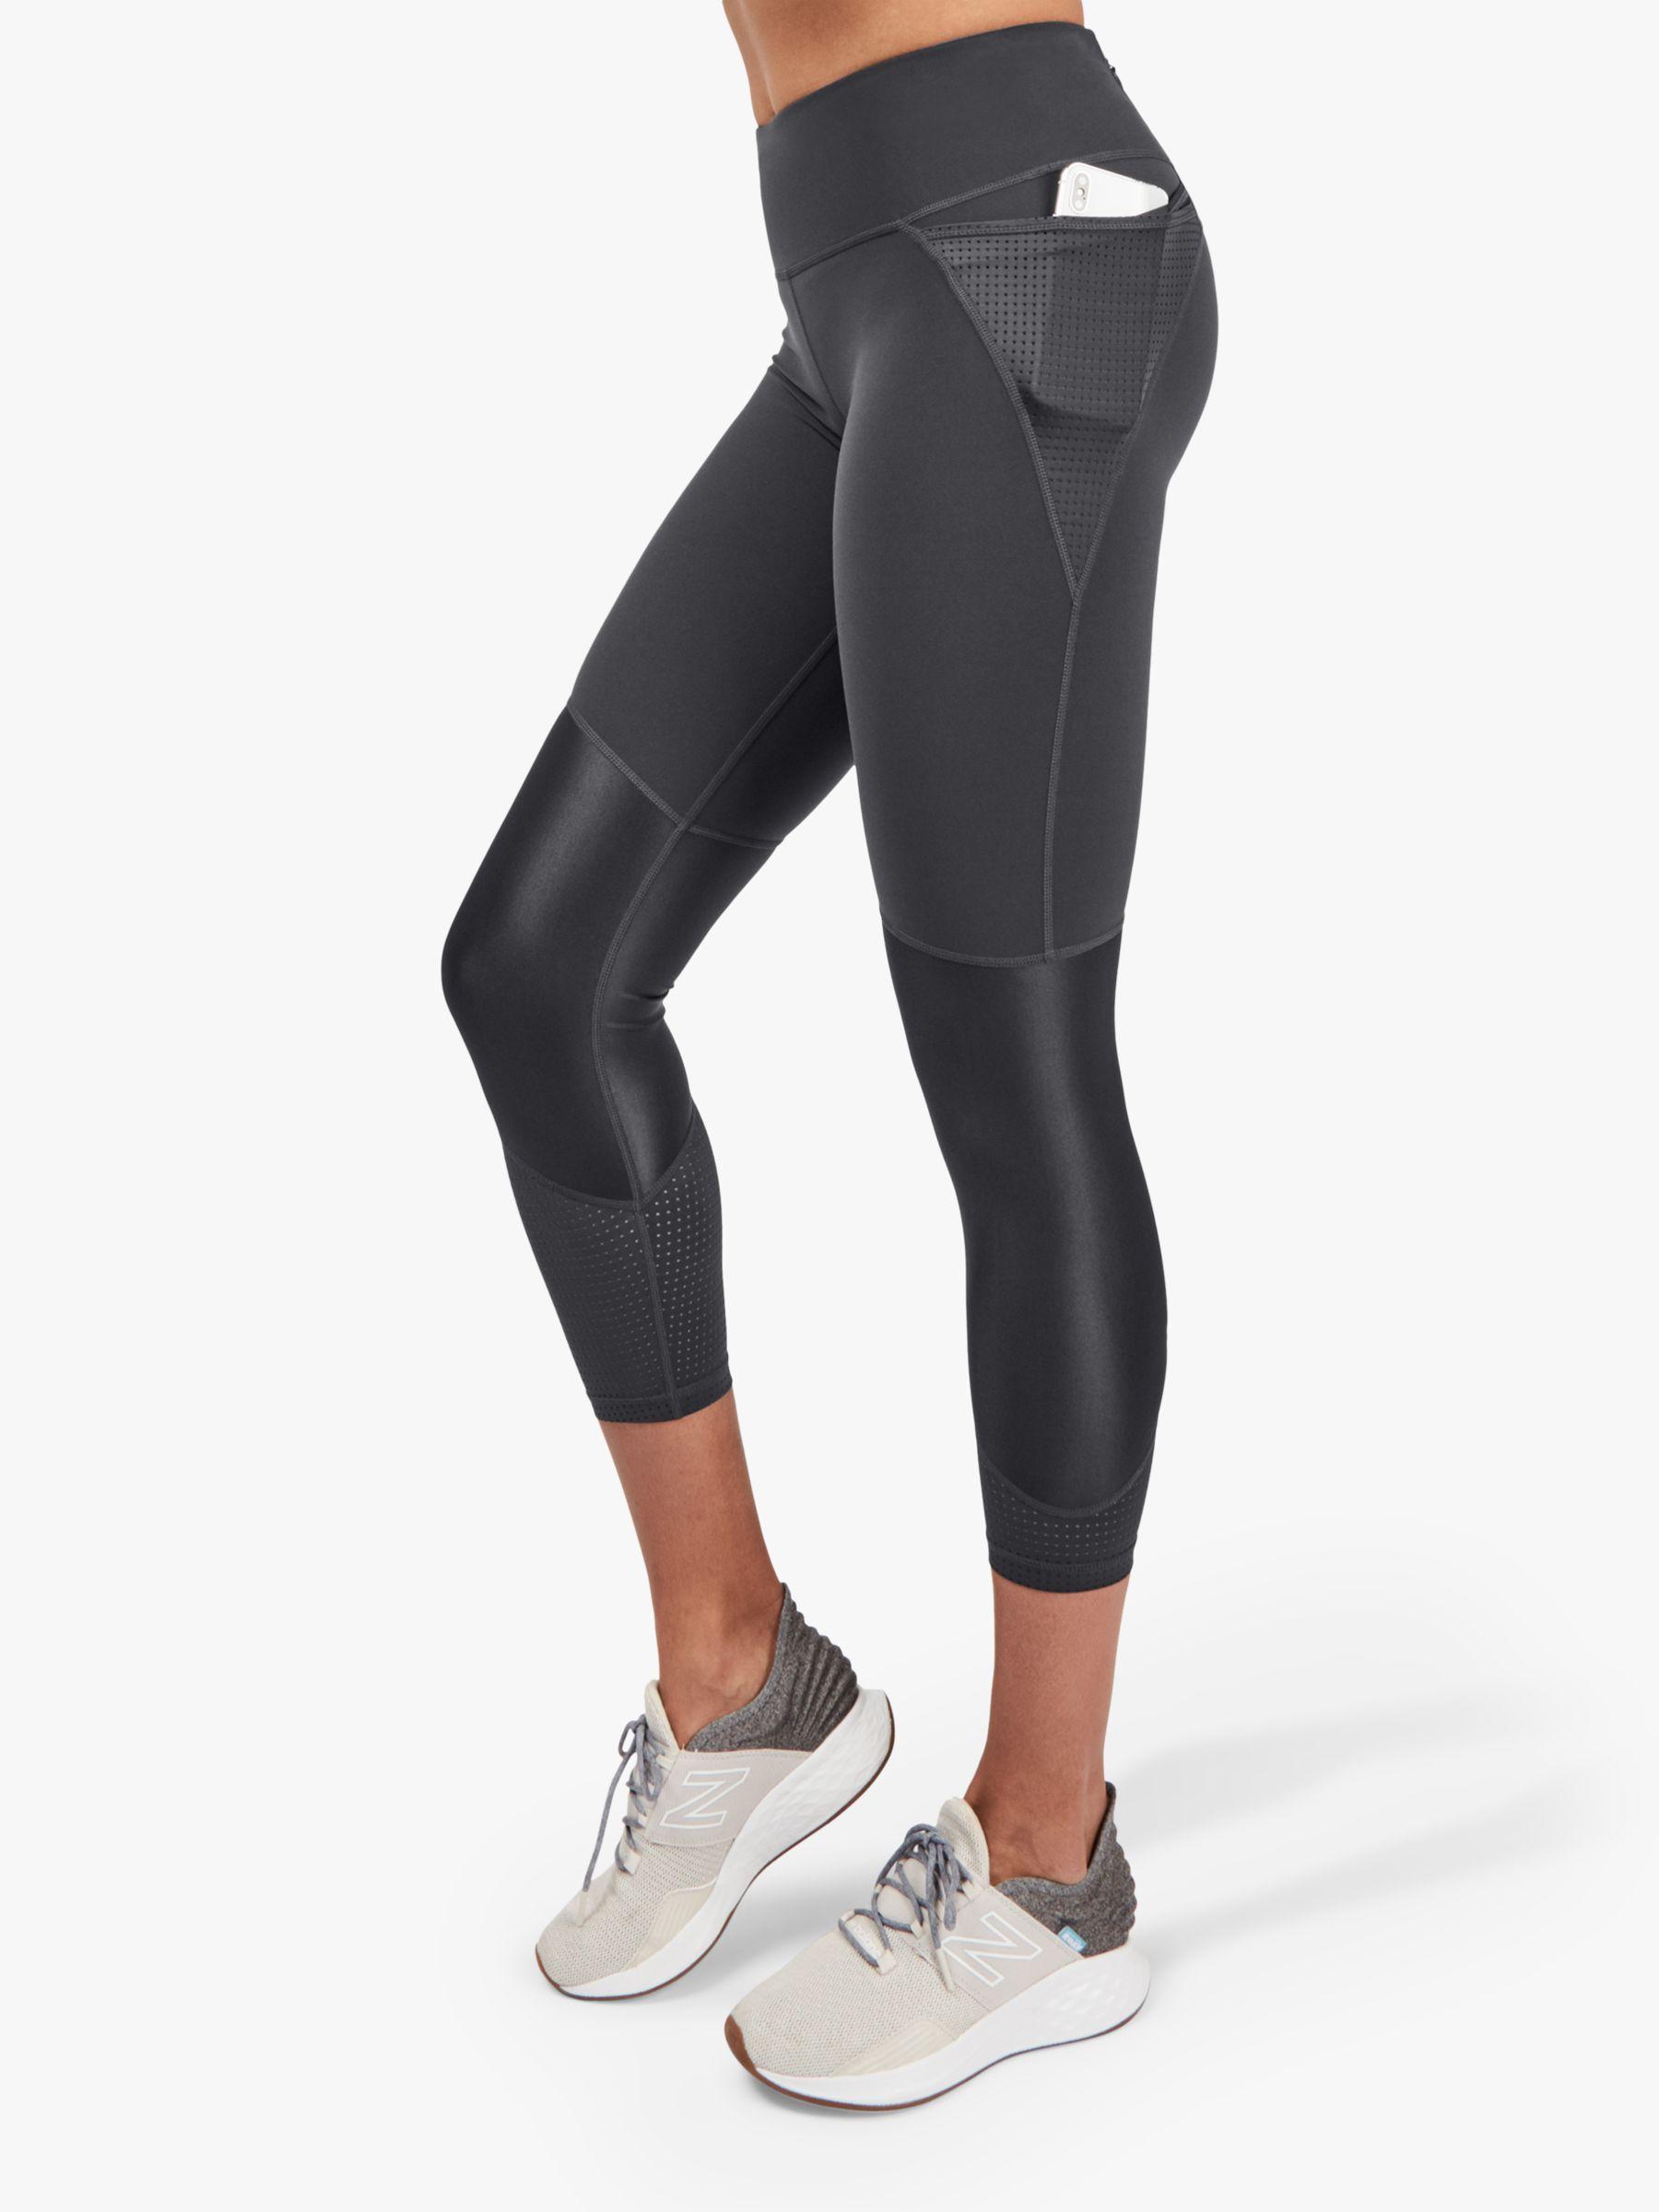 Sweaty Betty Power Mesh 7 8 Workout Leggings Slate Grey At John Lewis Partners